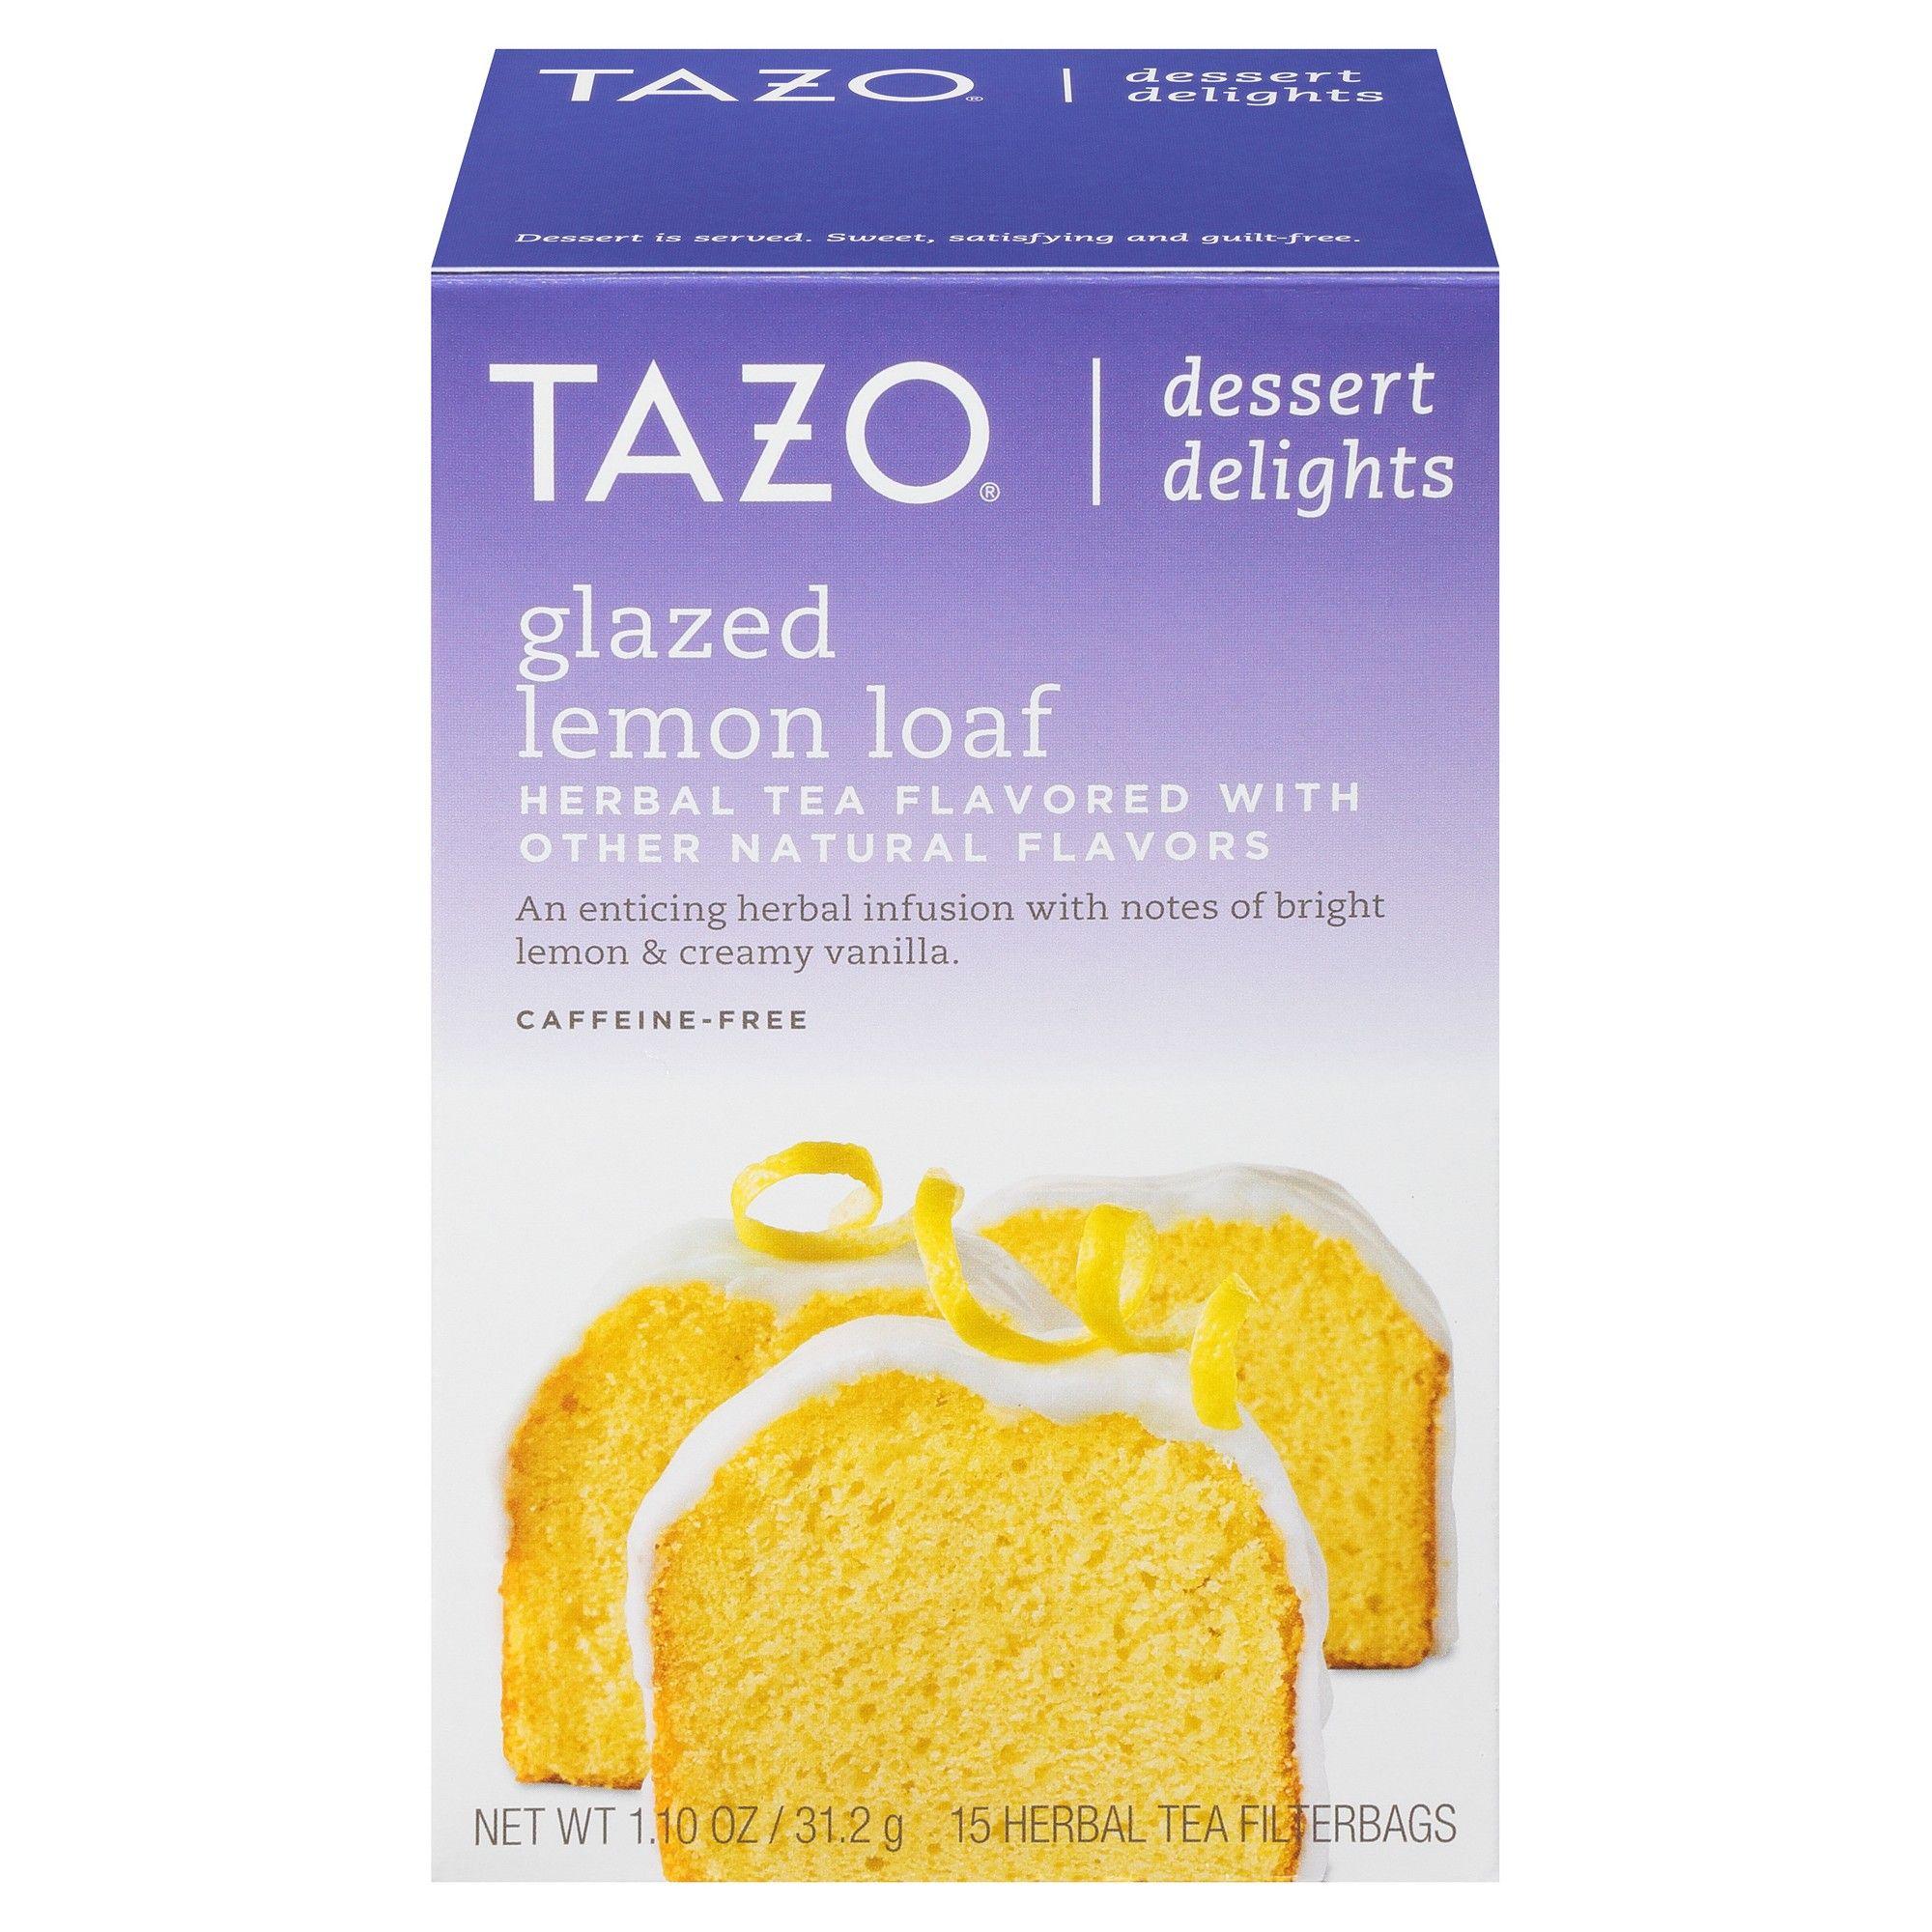 Summer Wedding Food: Tazo Glazed Lemon Loaf Dessert Delights Tea Bags